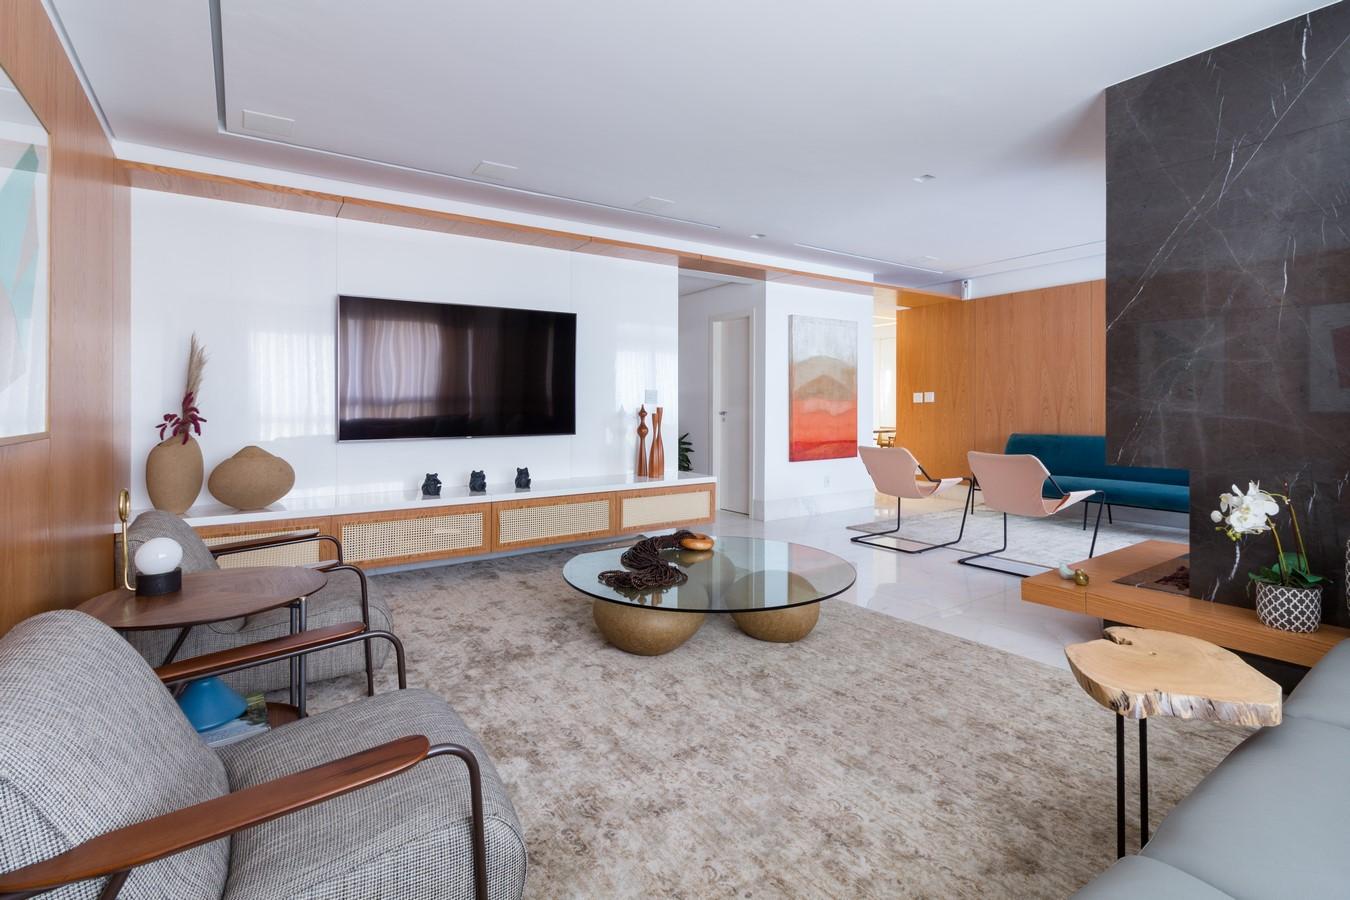 Apartamento ALM by Pedro Haruf Arquiteto - Sheet1